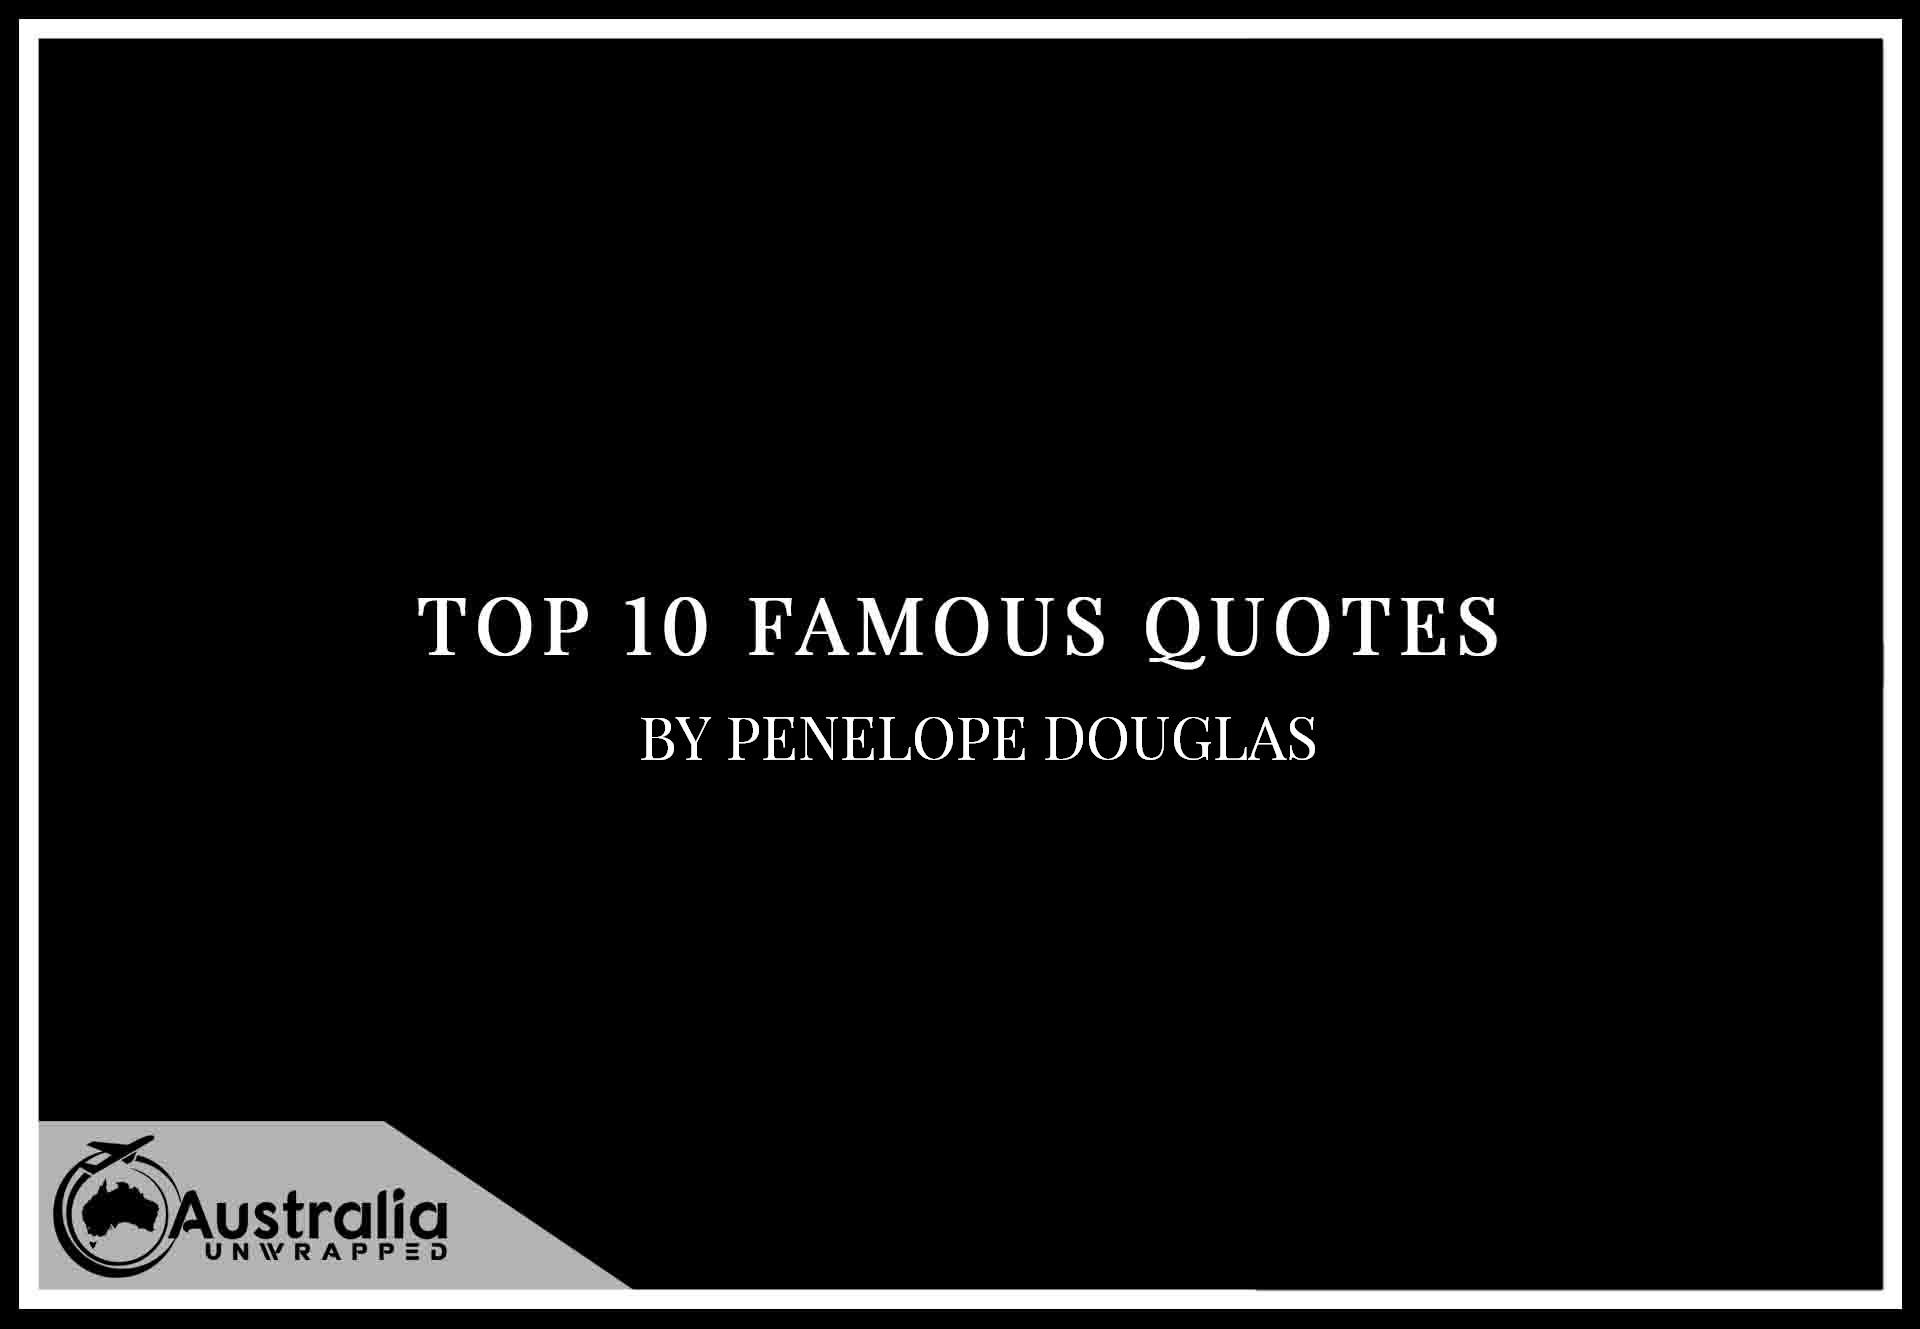 Top 10 Famous Quotes by Author Penelope Douglas